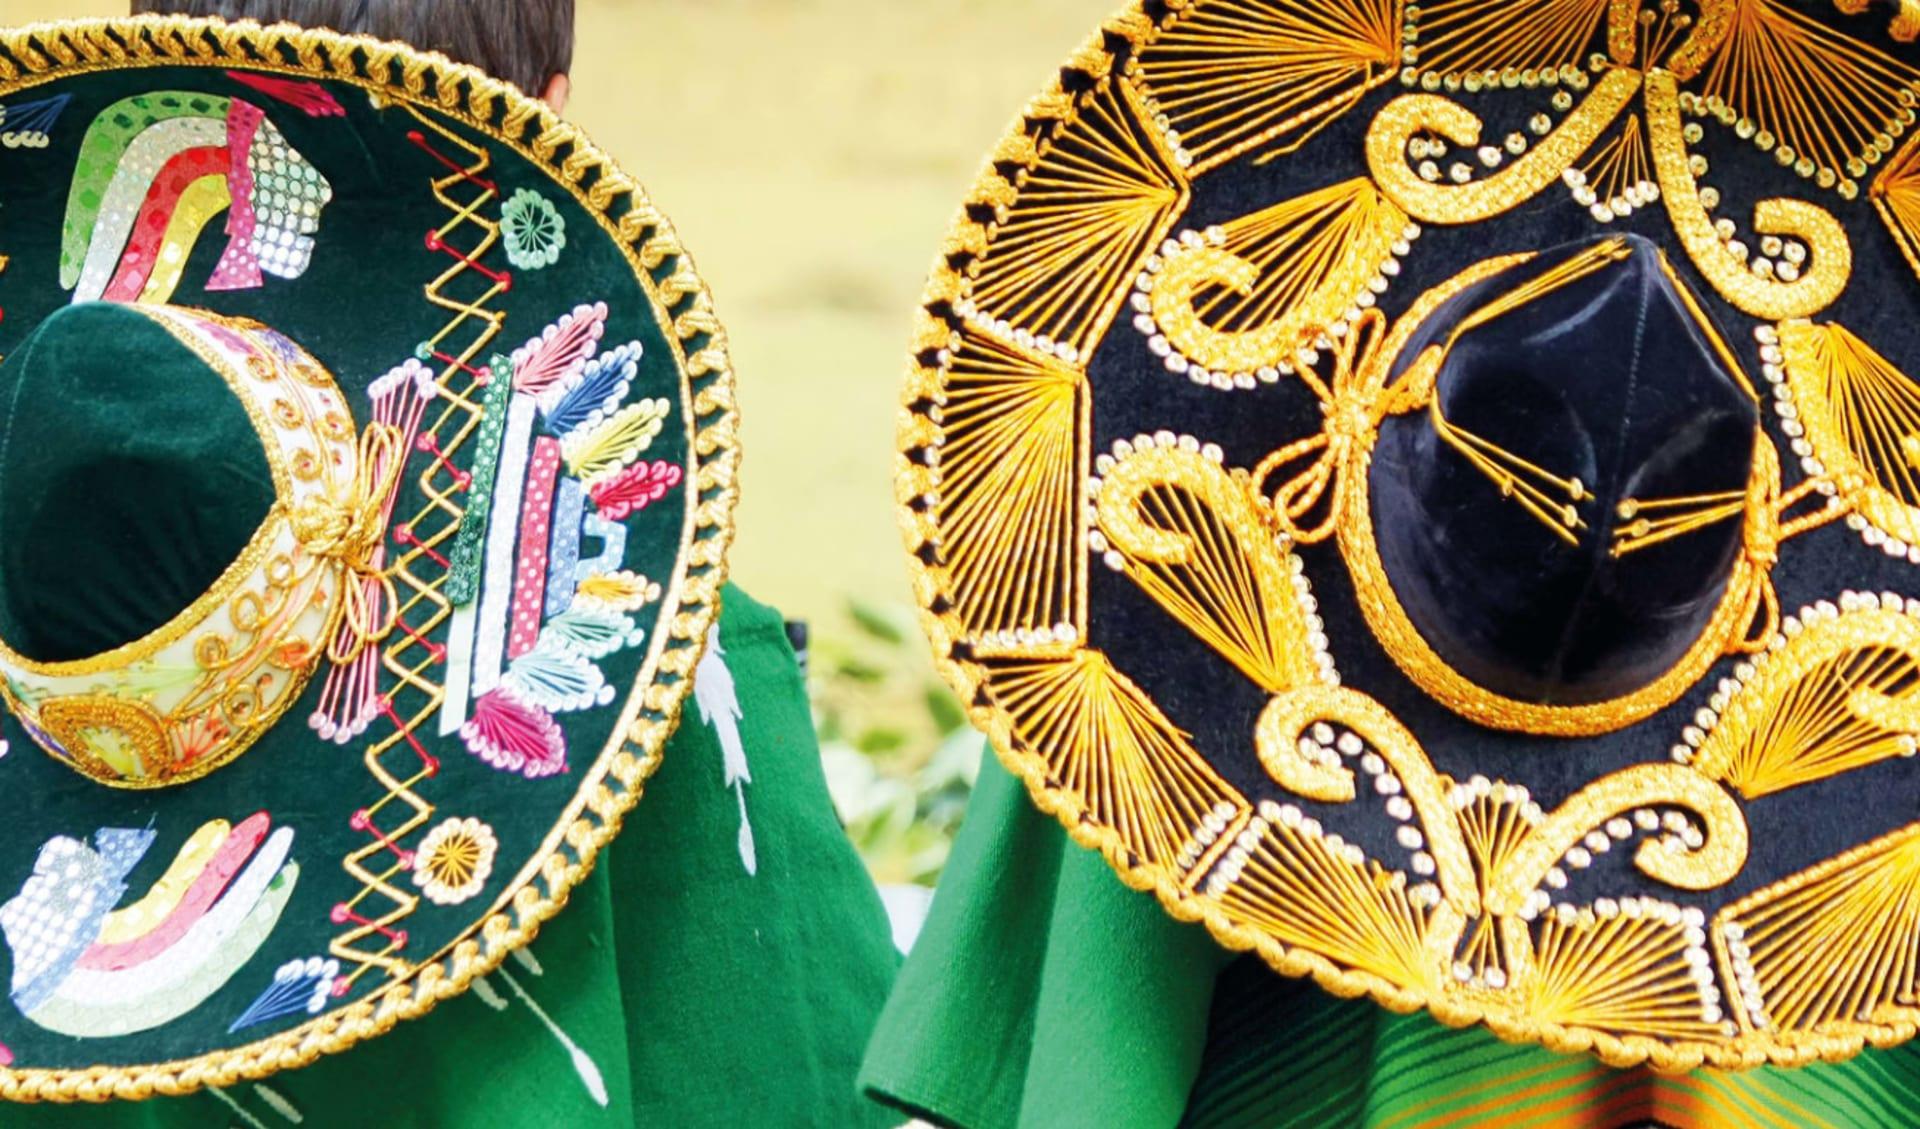 Yucatán Familienreise ab Cancun: Mexiko - Sombreros